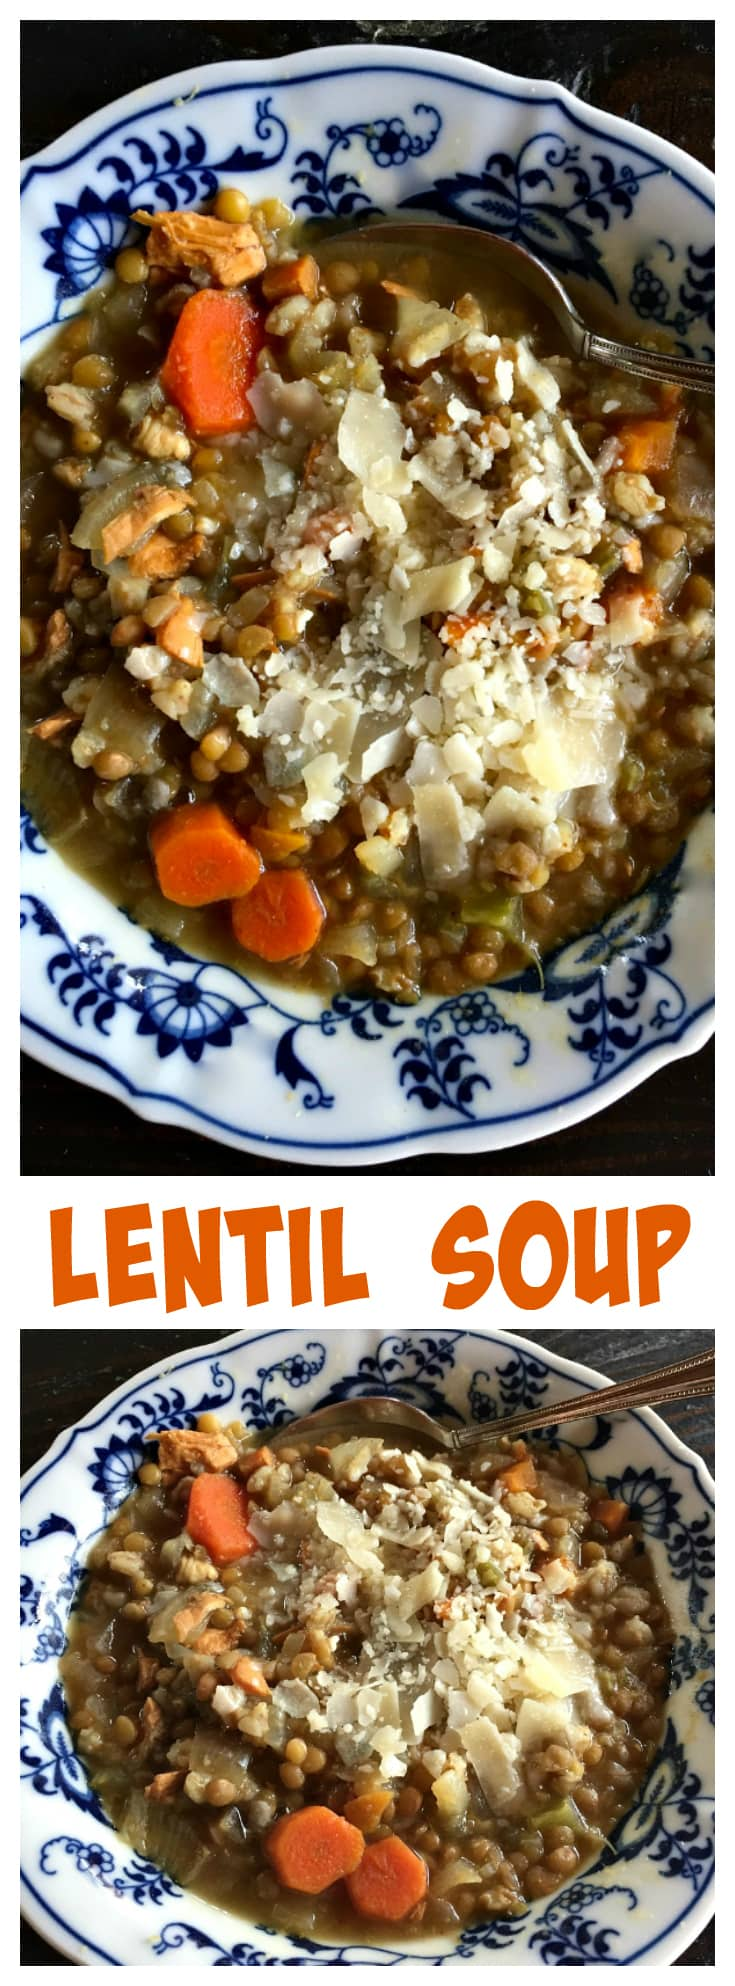 Lentil Soup at ReluctantEntertainer.com